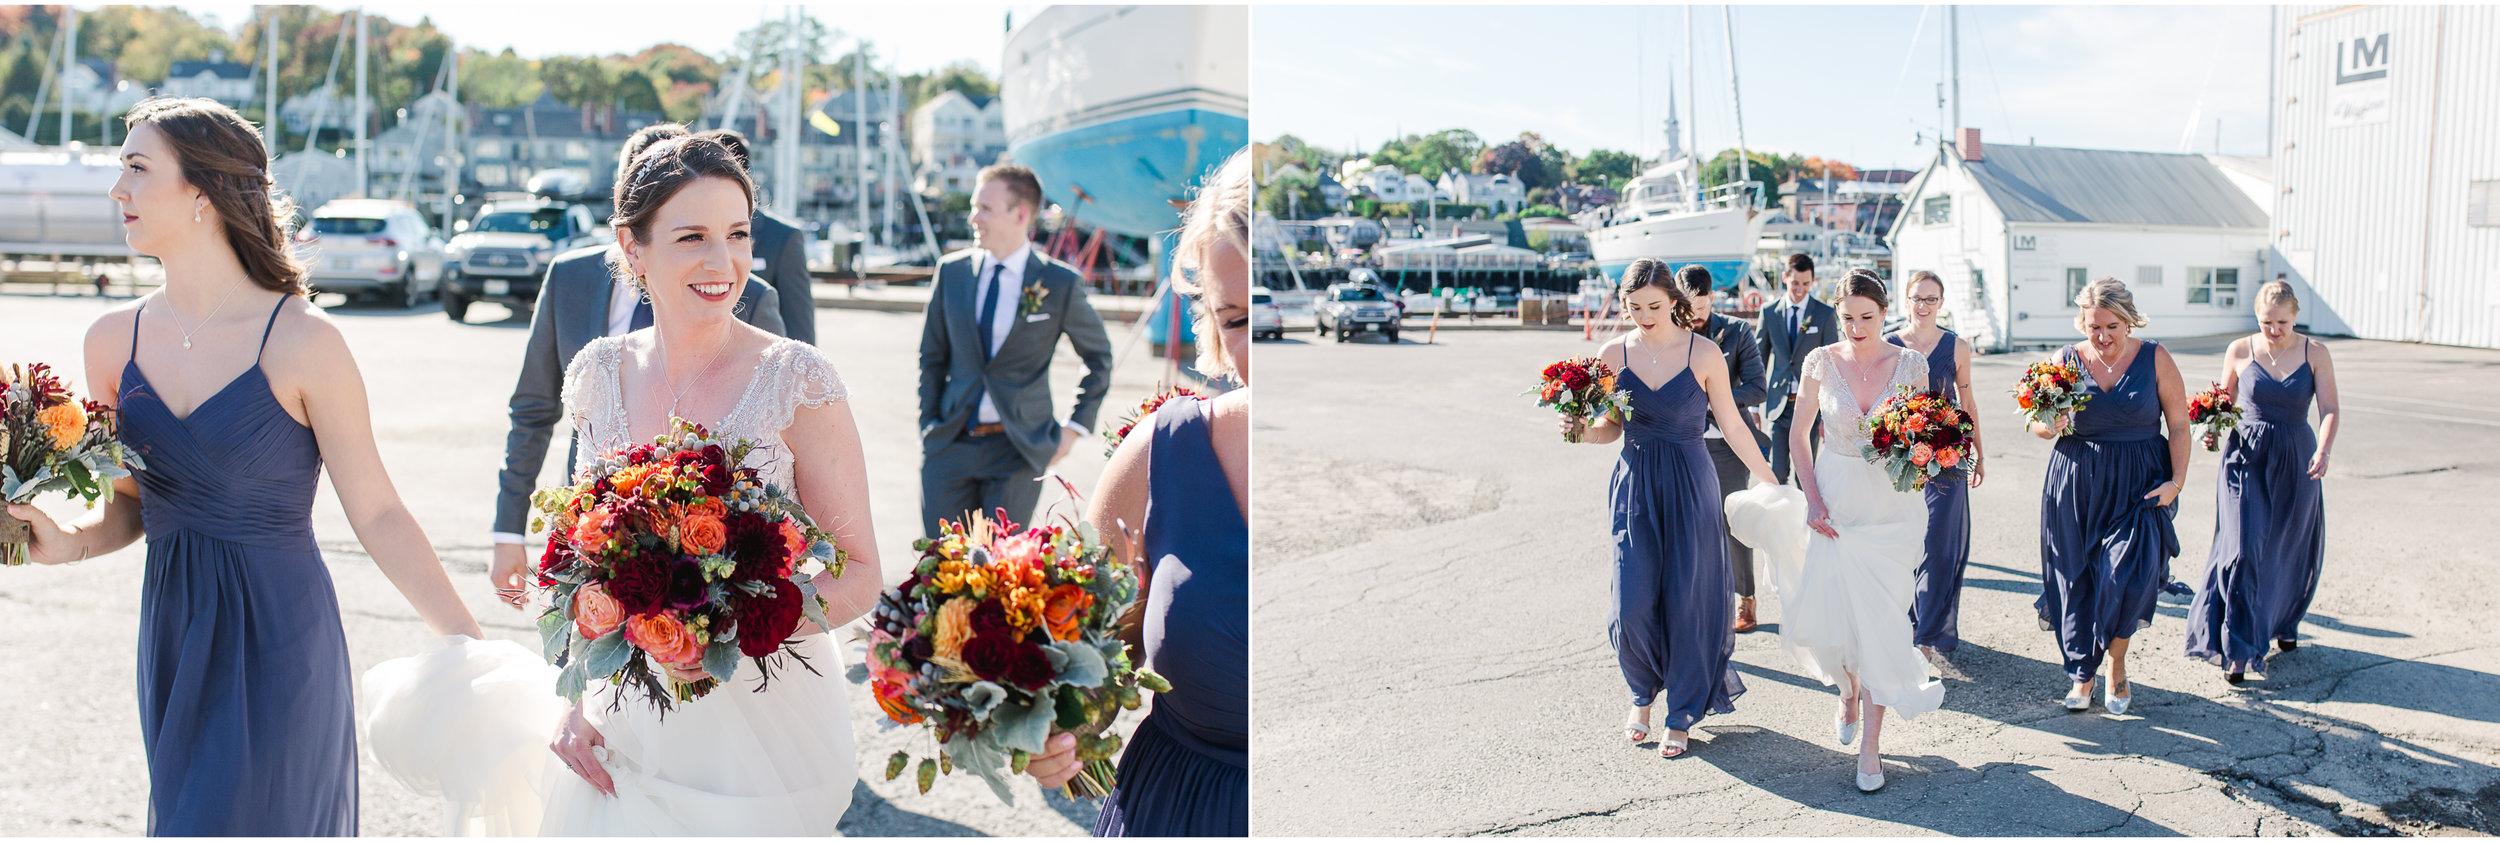 Camden Maine Wedding 9.jpg